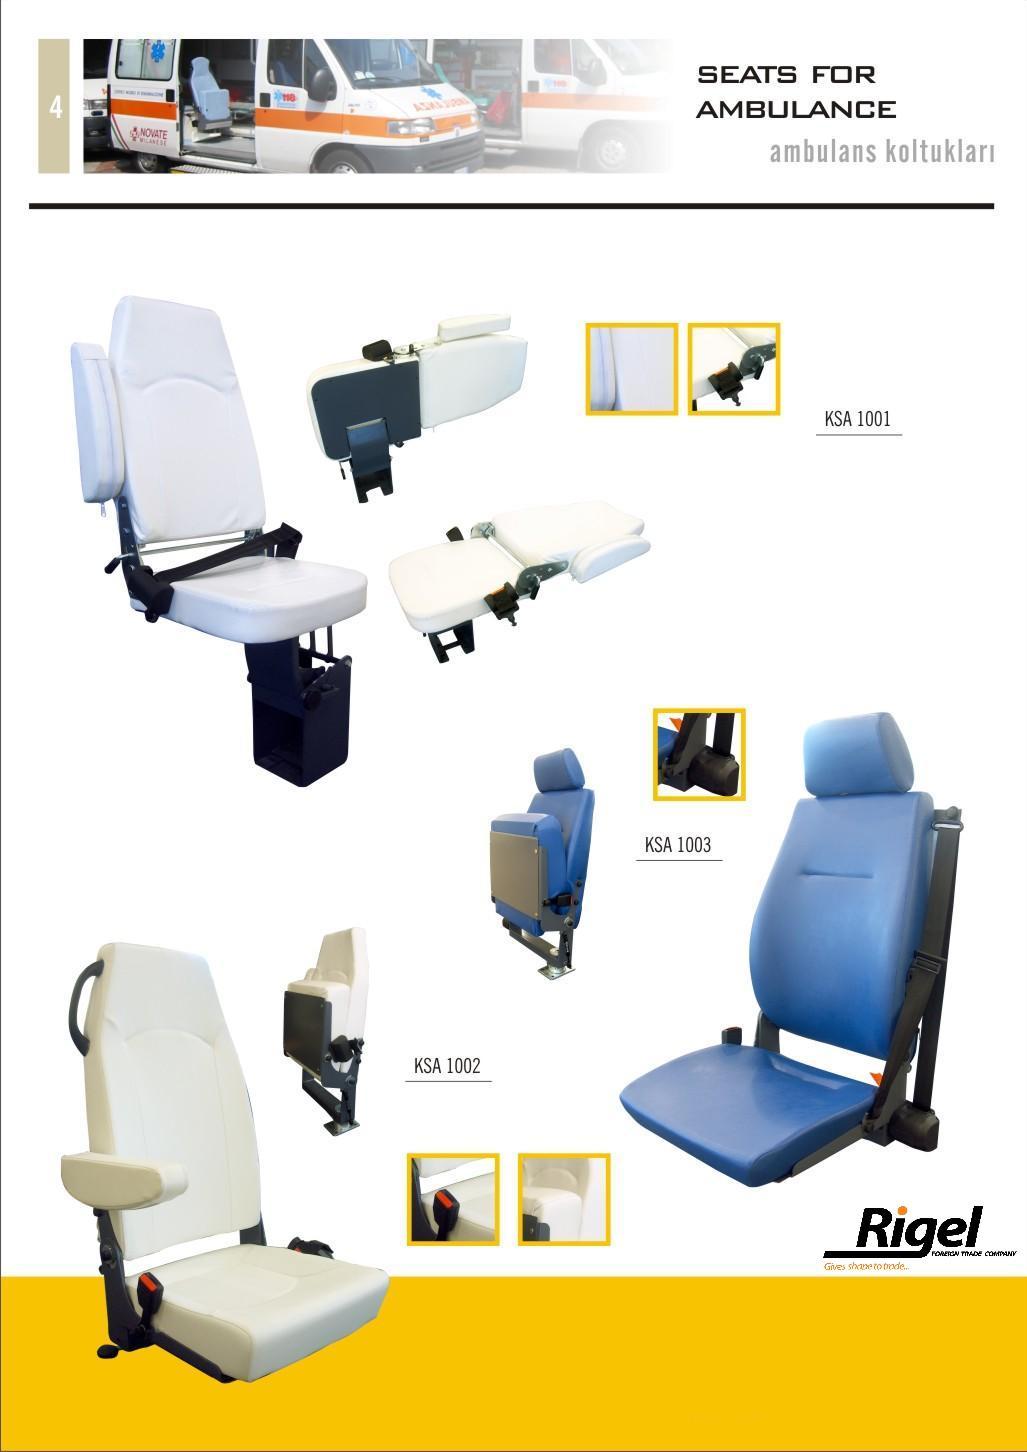 Ambulance Seats And Parts